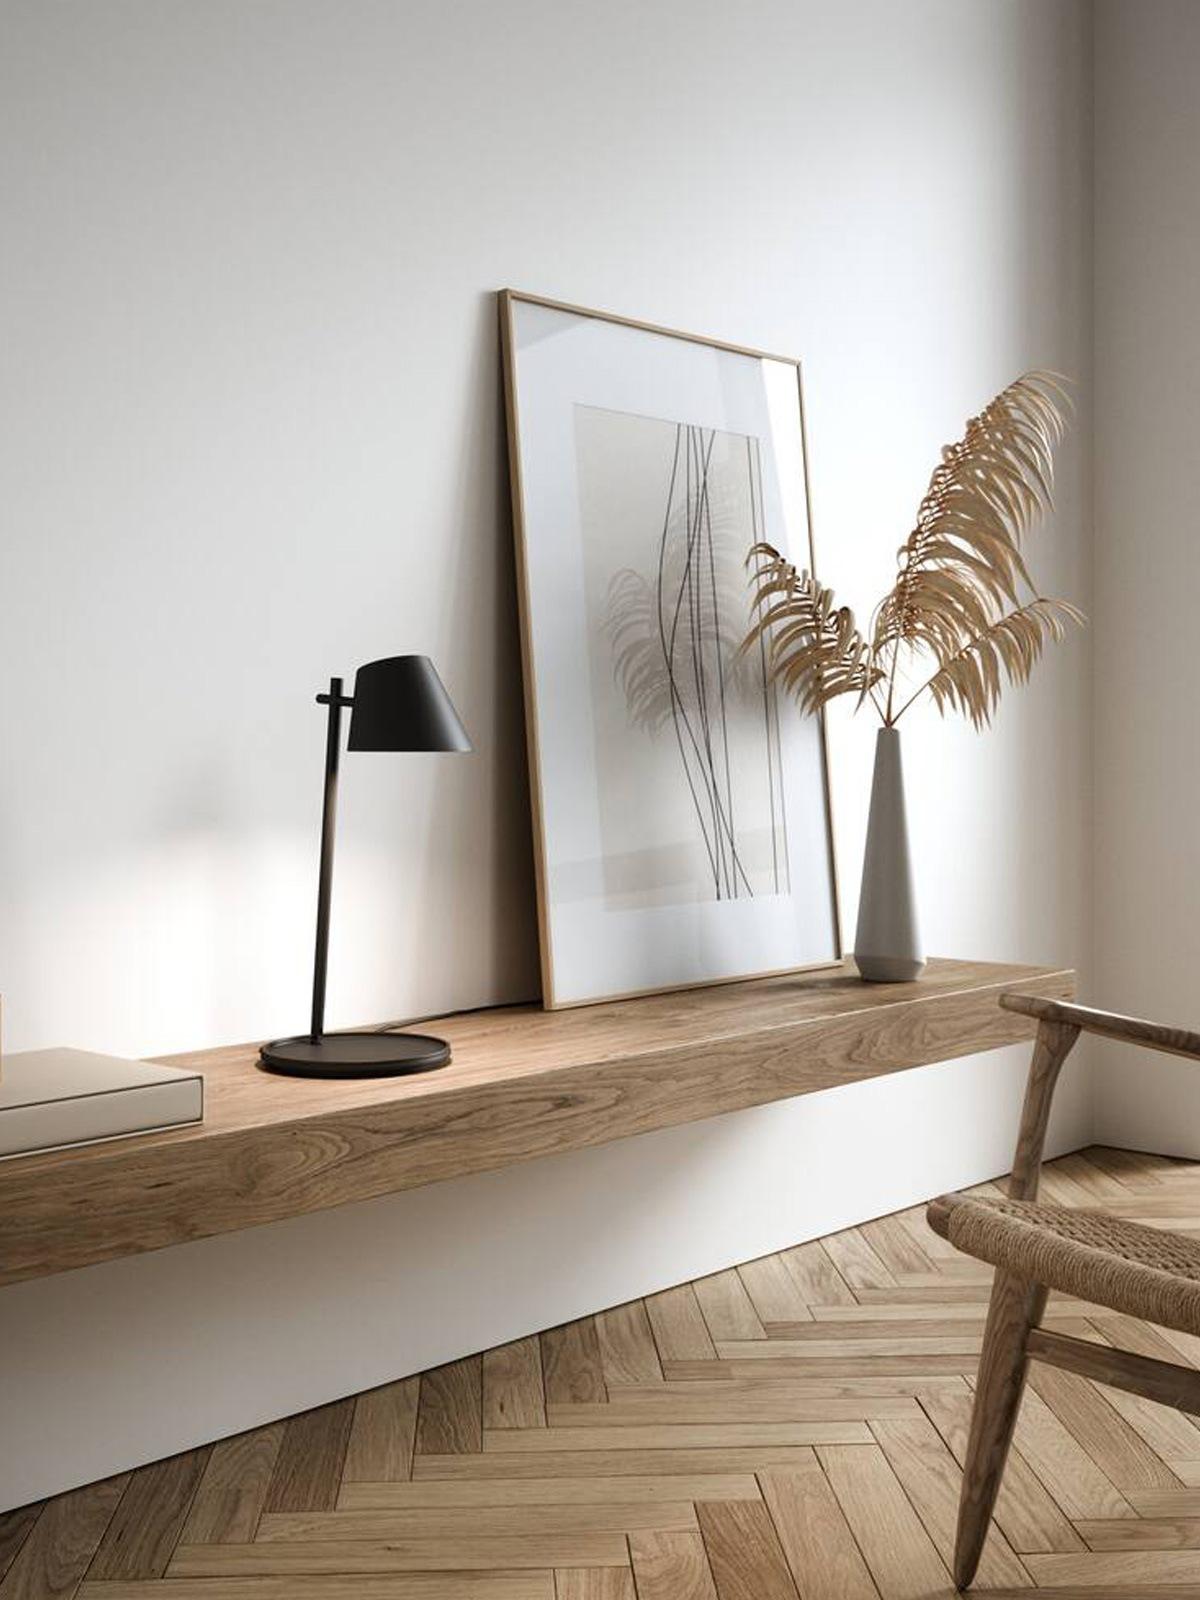 Design for the People Stay Table Tischlampe DesignOrt Onlineshop Lampen Berlin